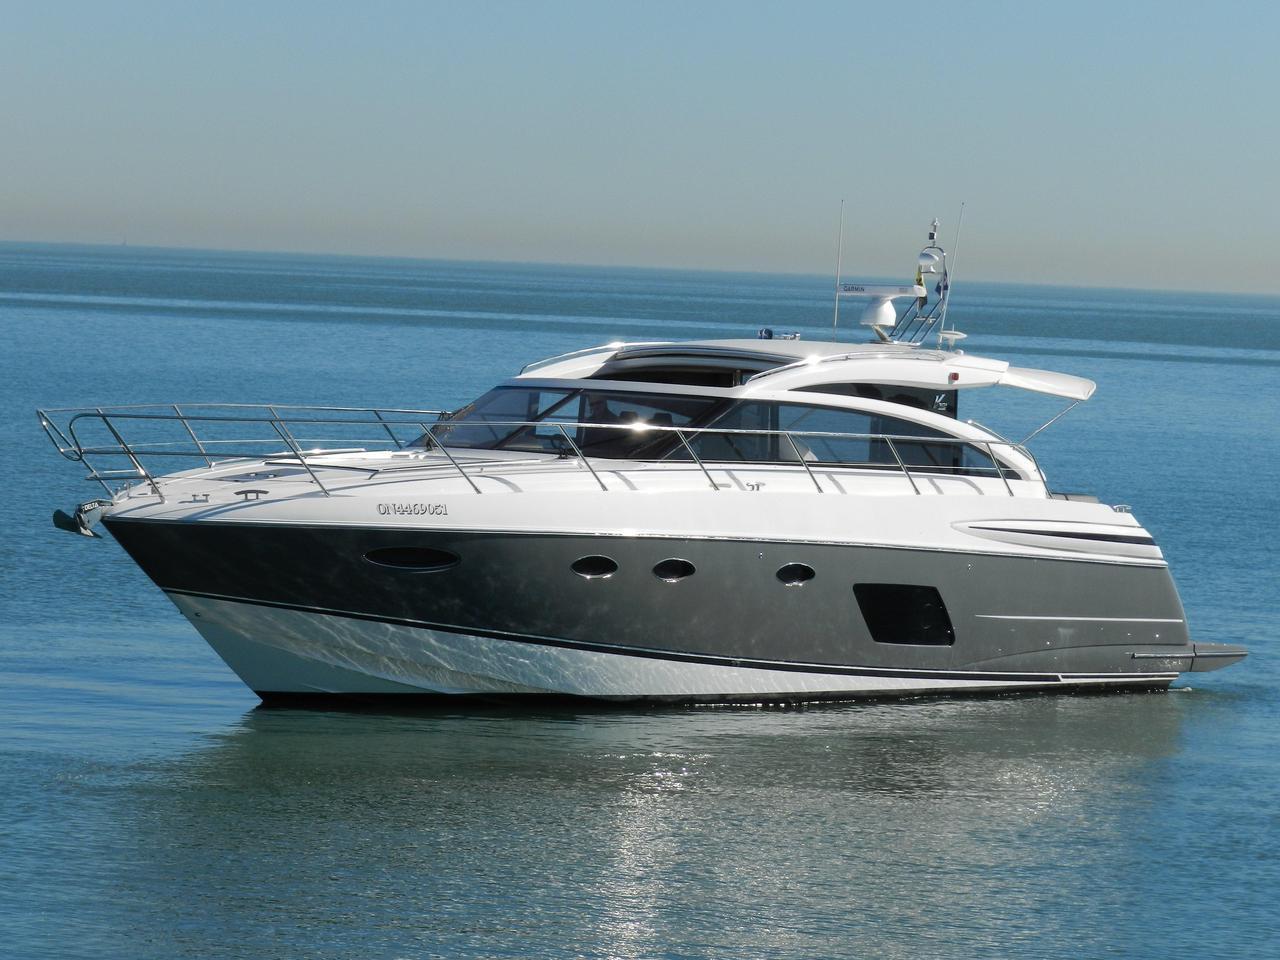 2015 Used Princess V52 Motor Yacht For Sale 899 000